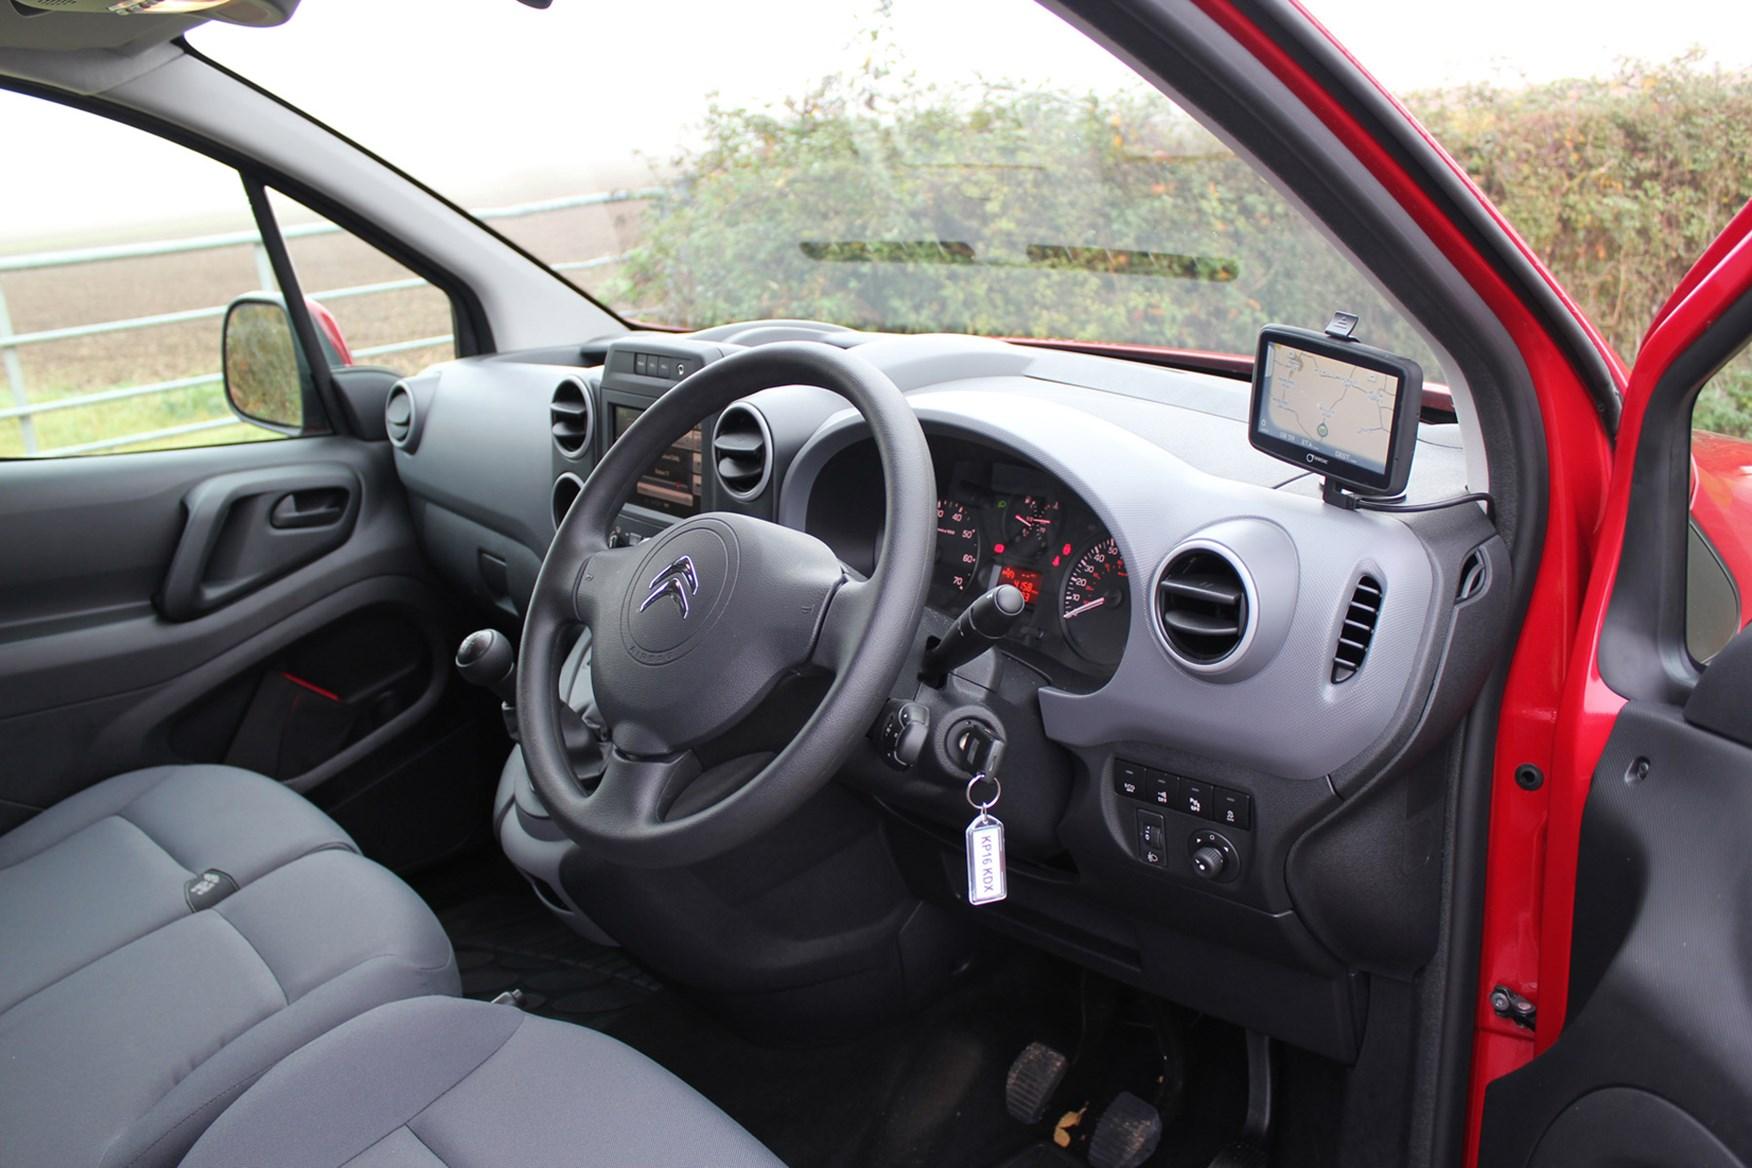 Citroen Berlingo full review on Parkers Vans - interior